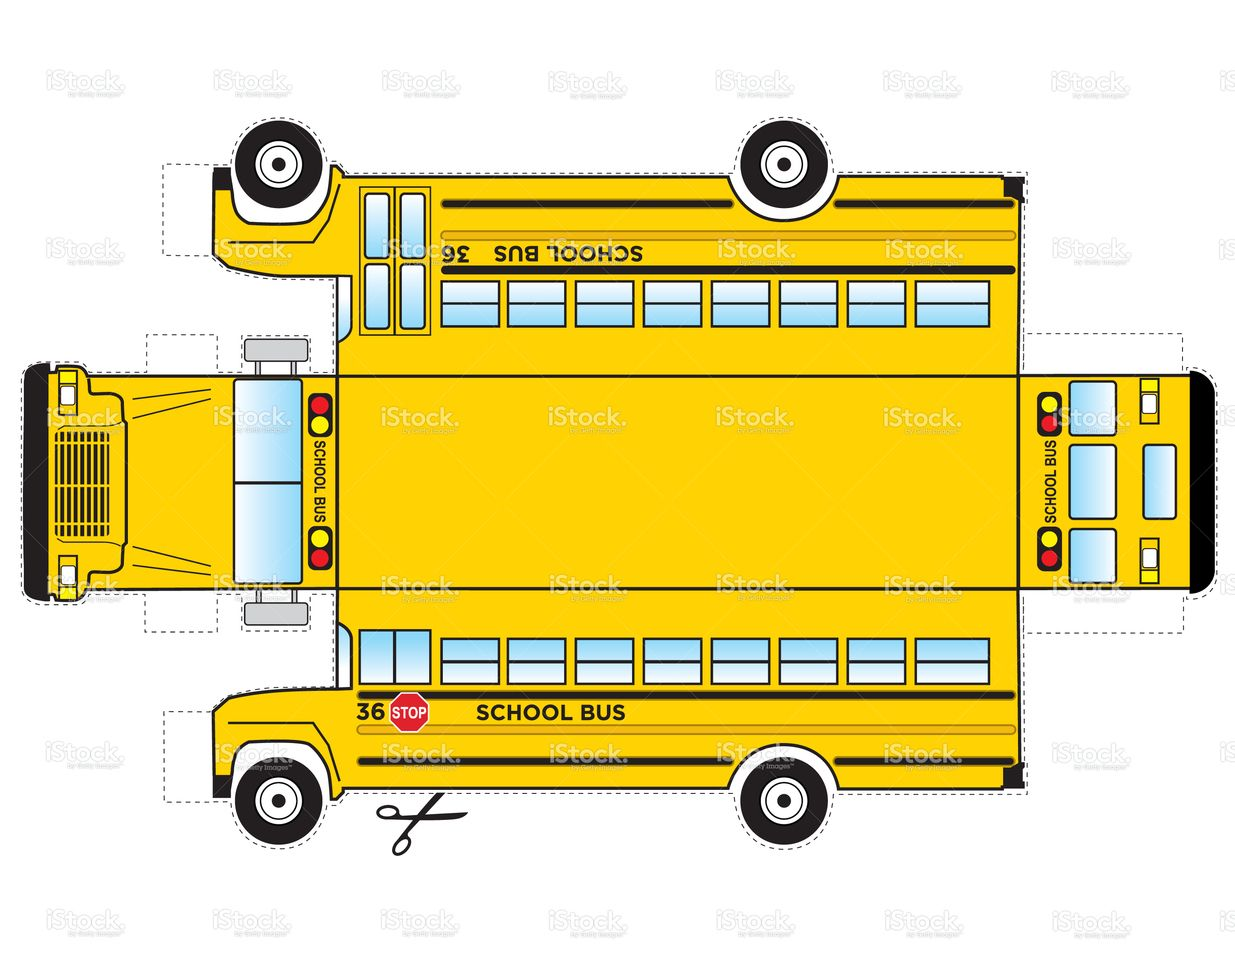 School bus templates idealstalist school bus templates toneelgroepblik Gallery